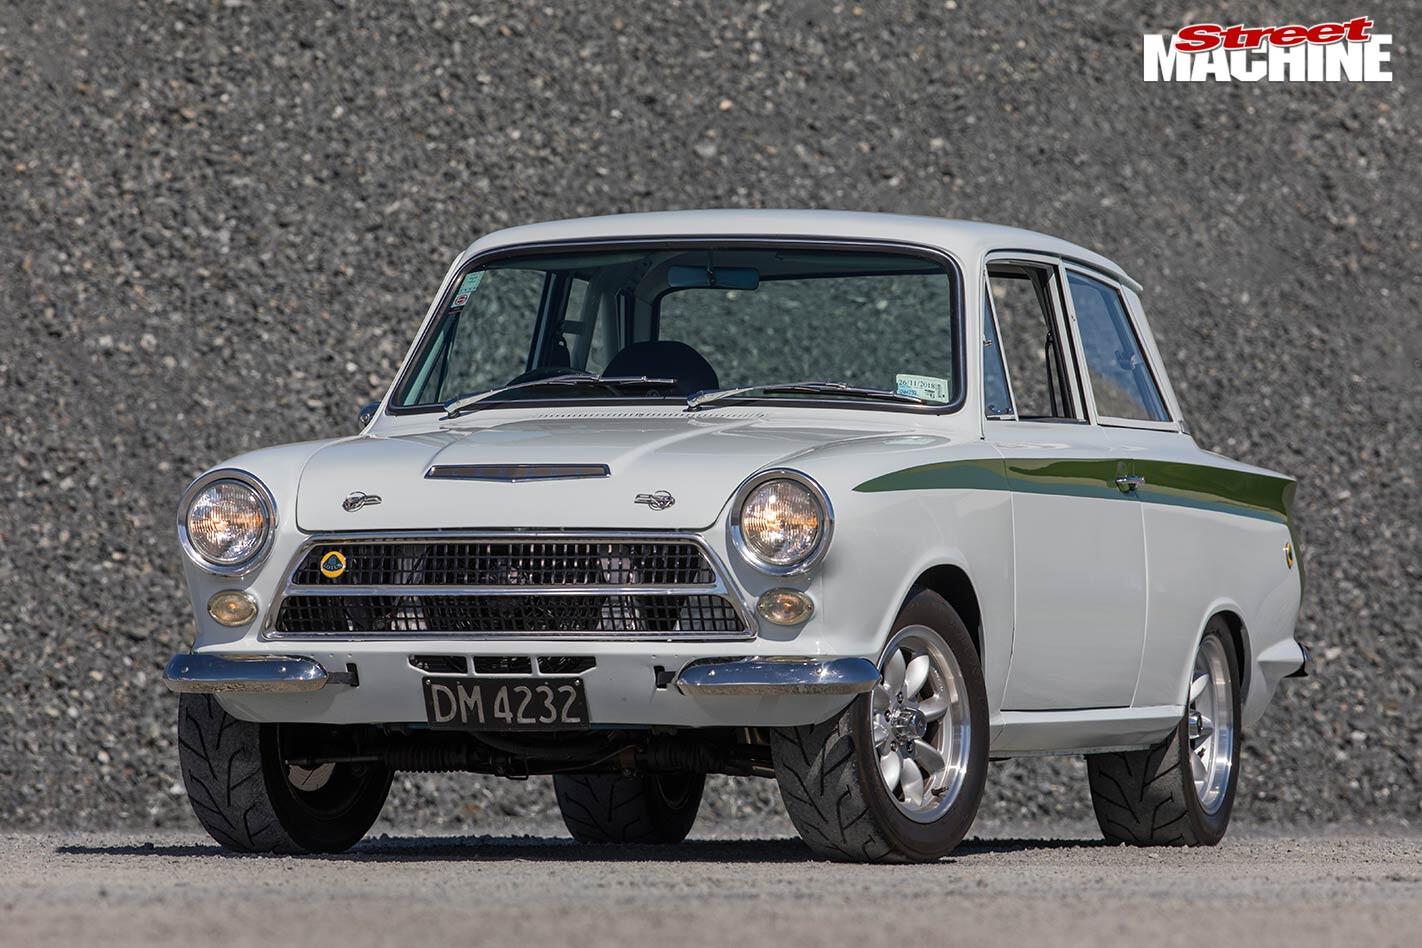 Lotus Cortina replica front